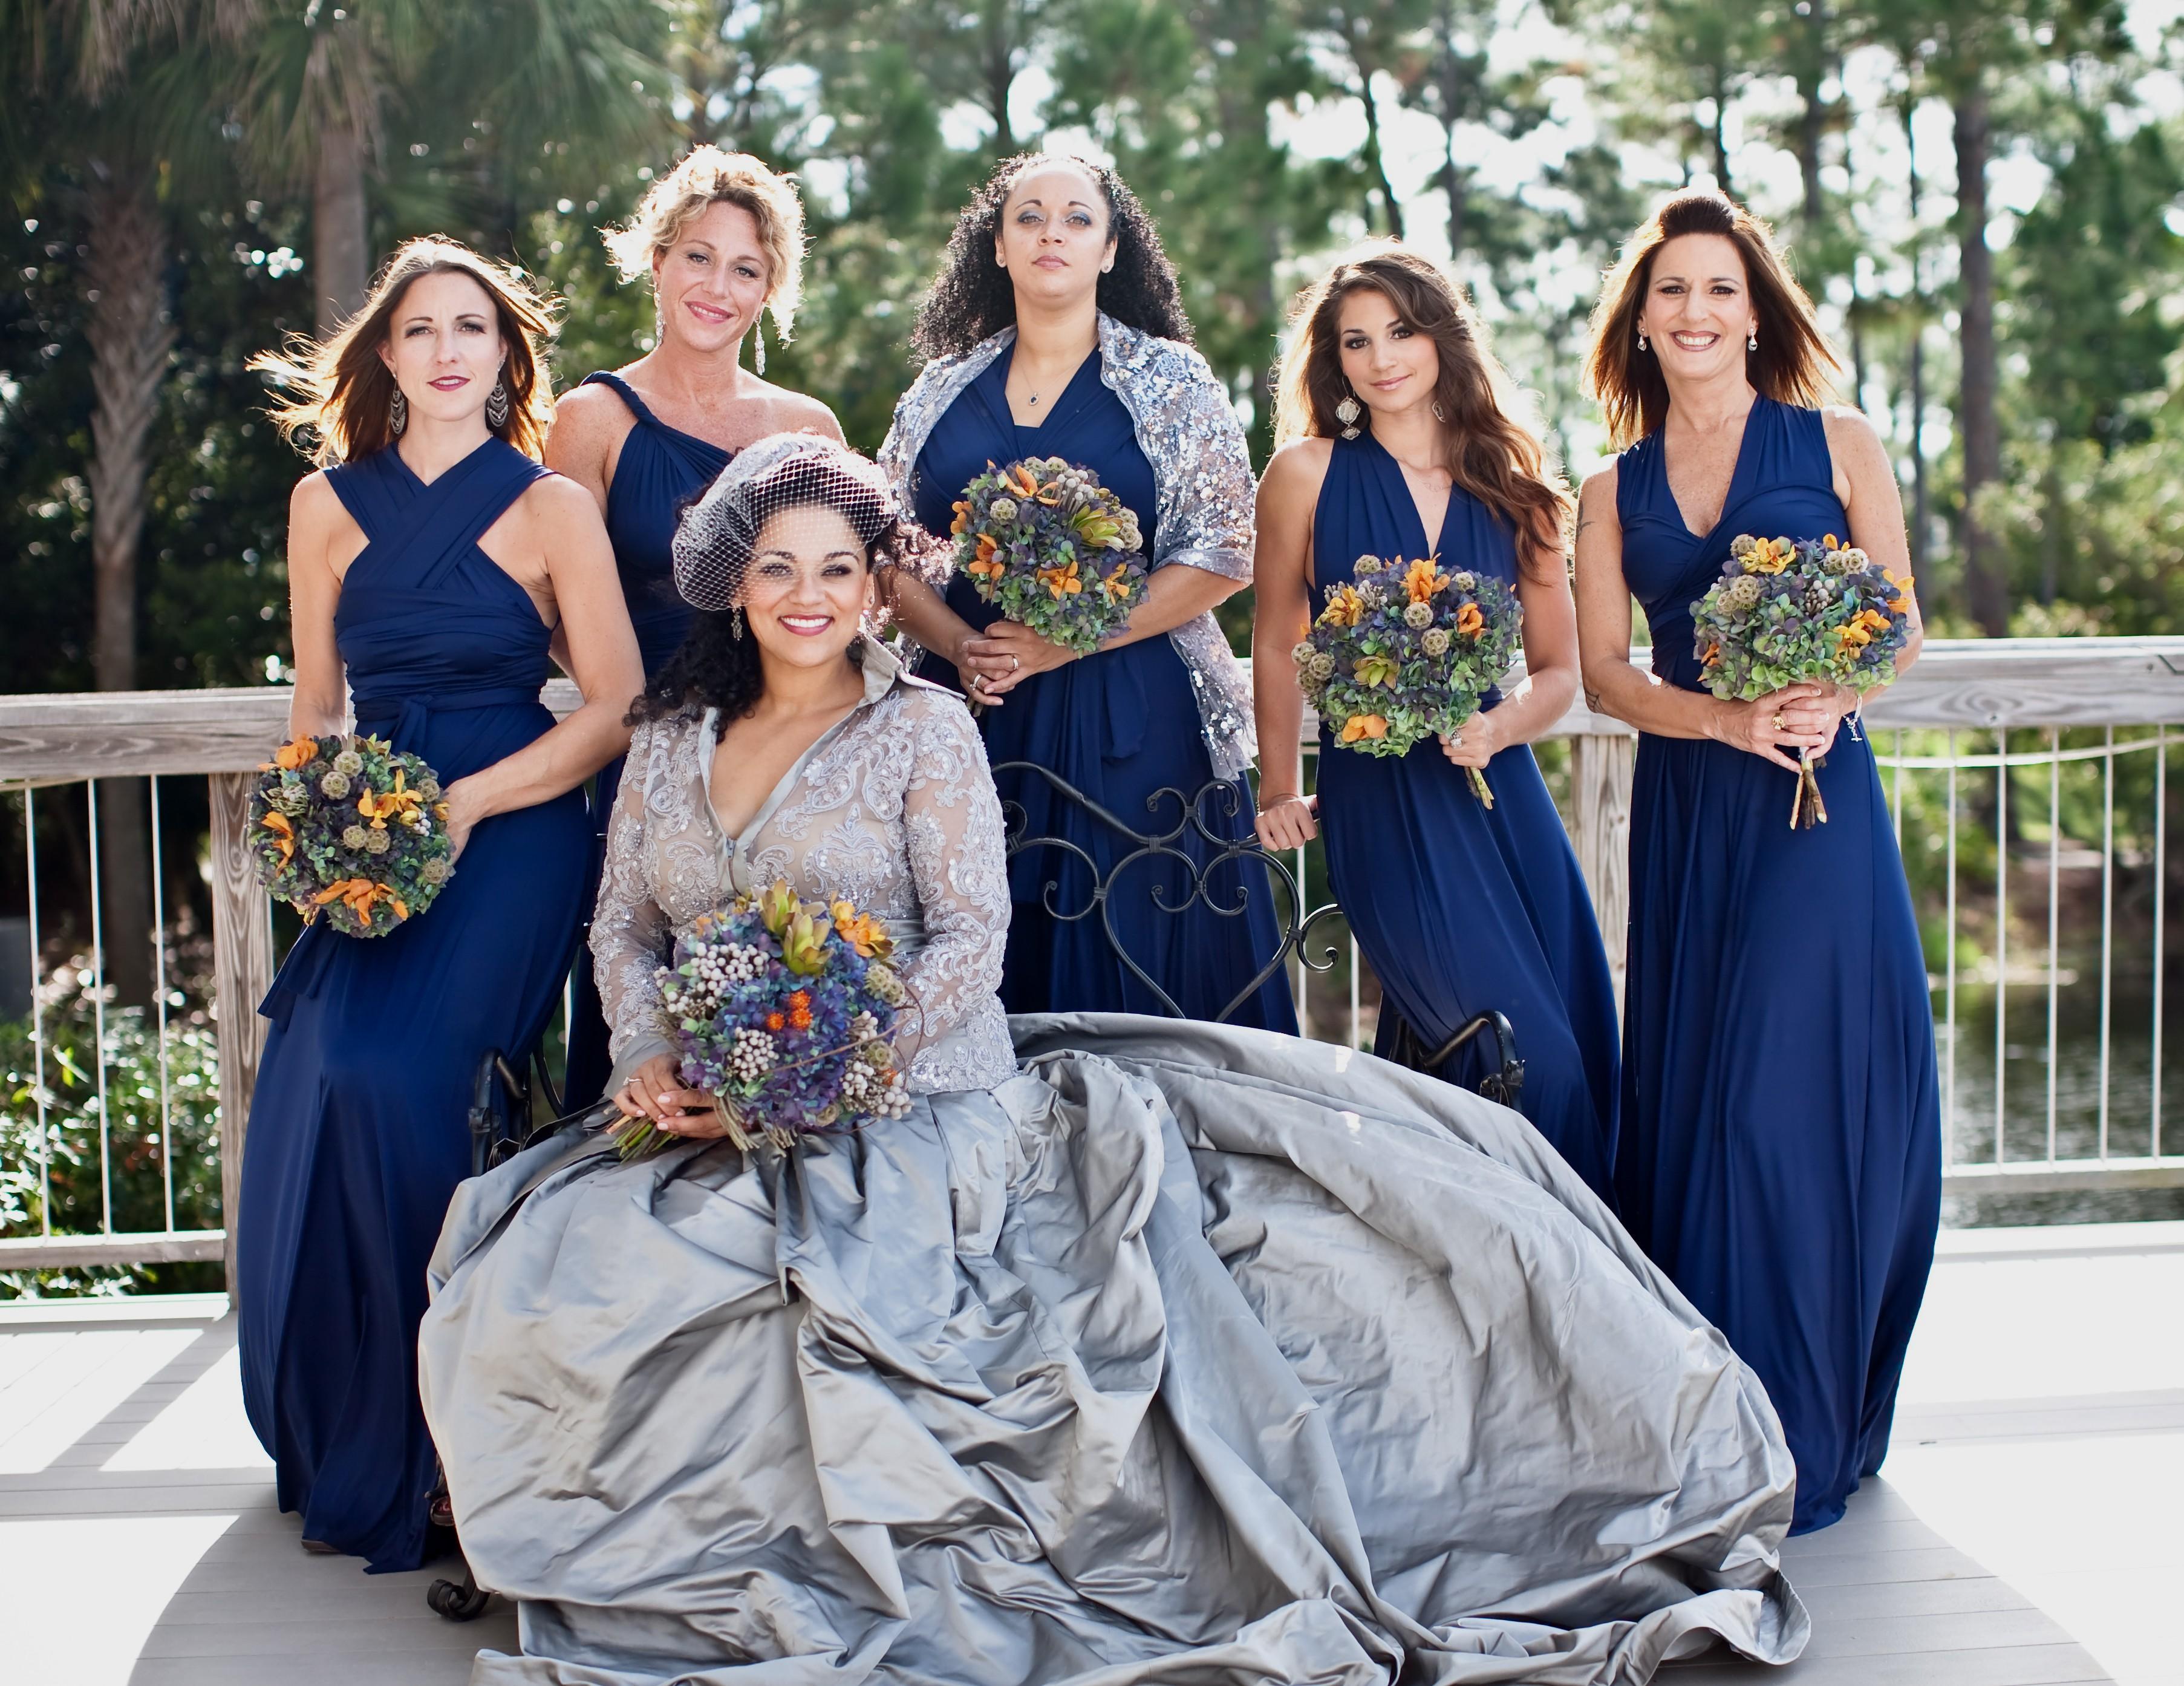 winter wedding bridesmaid dresses photo - 1